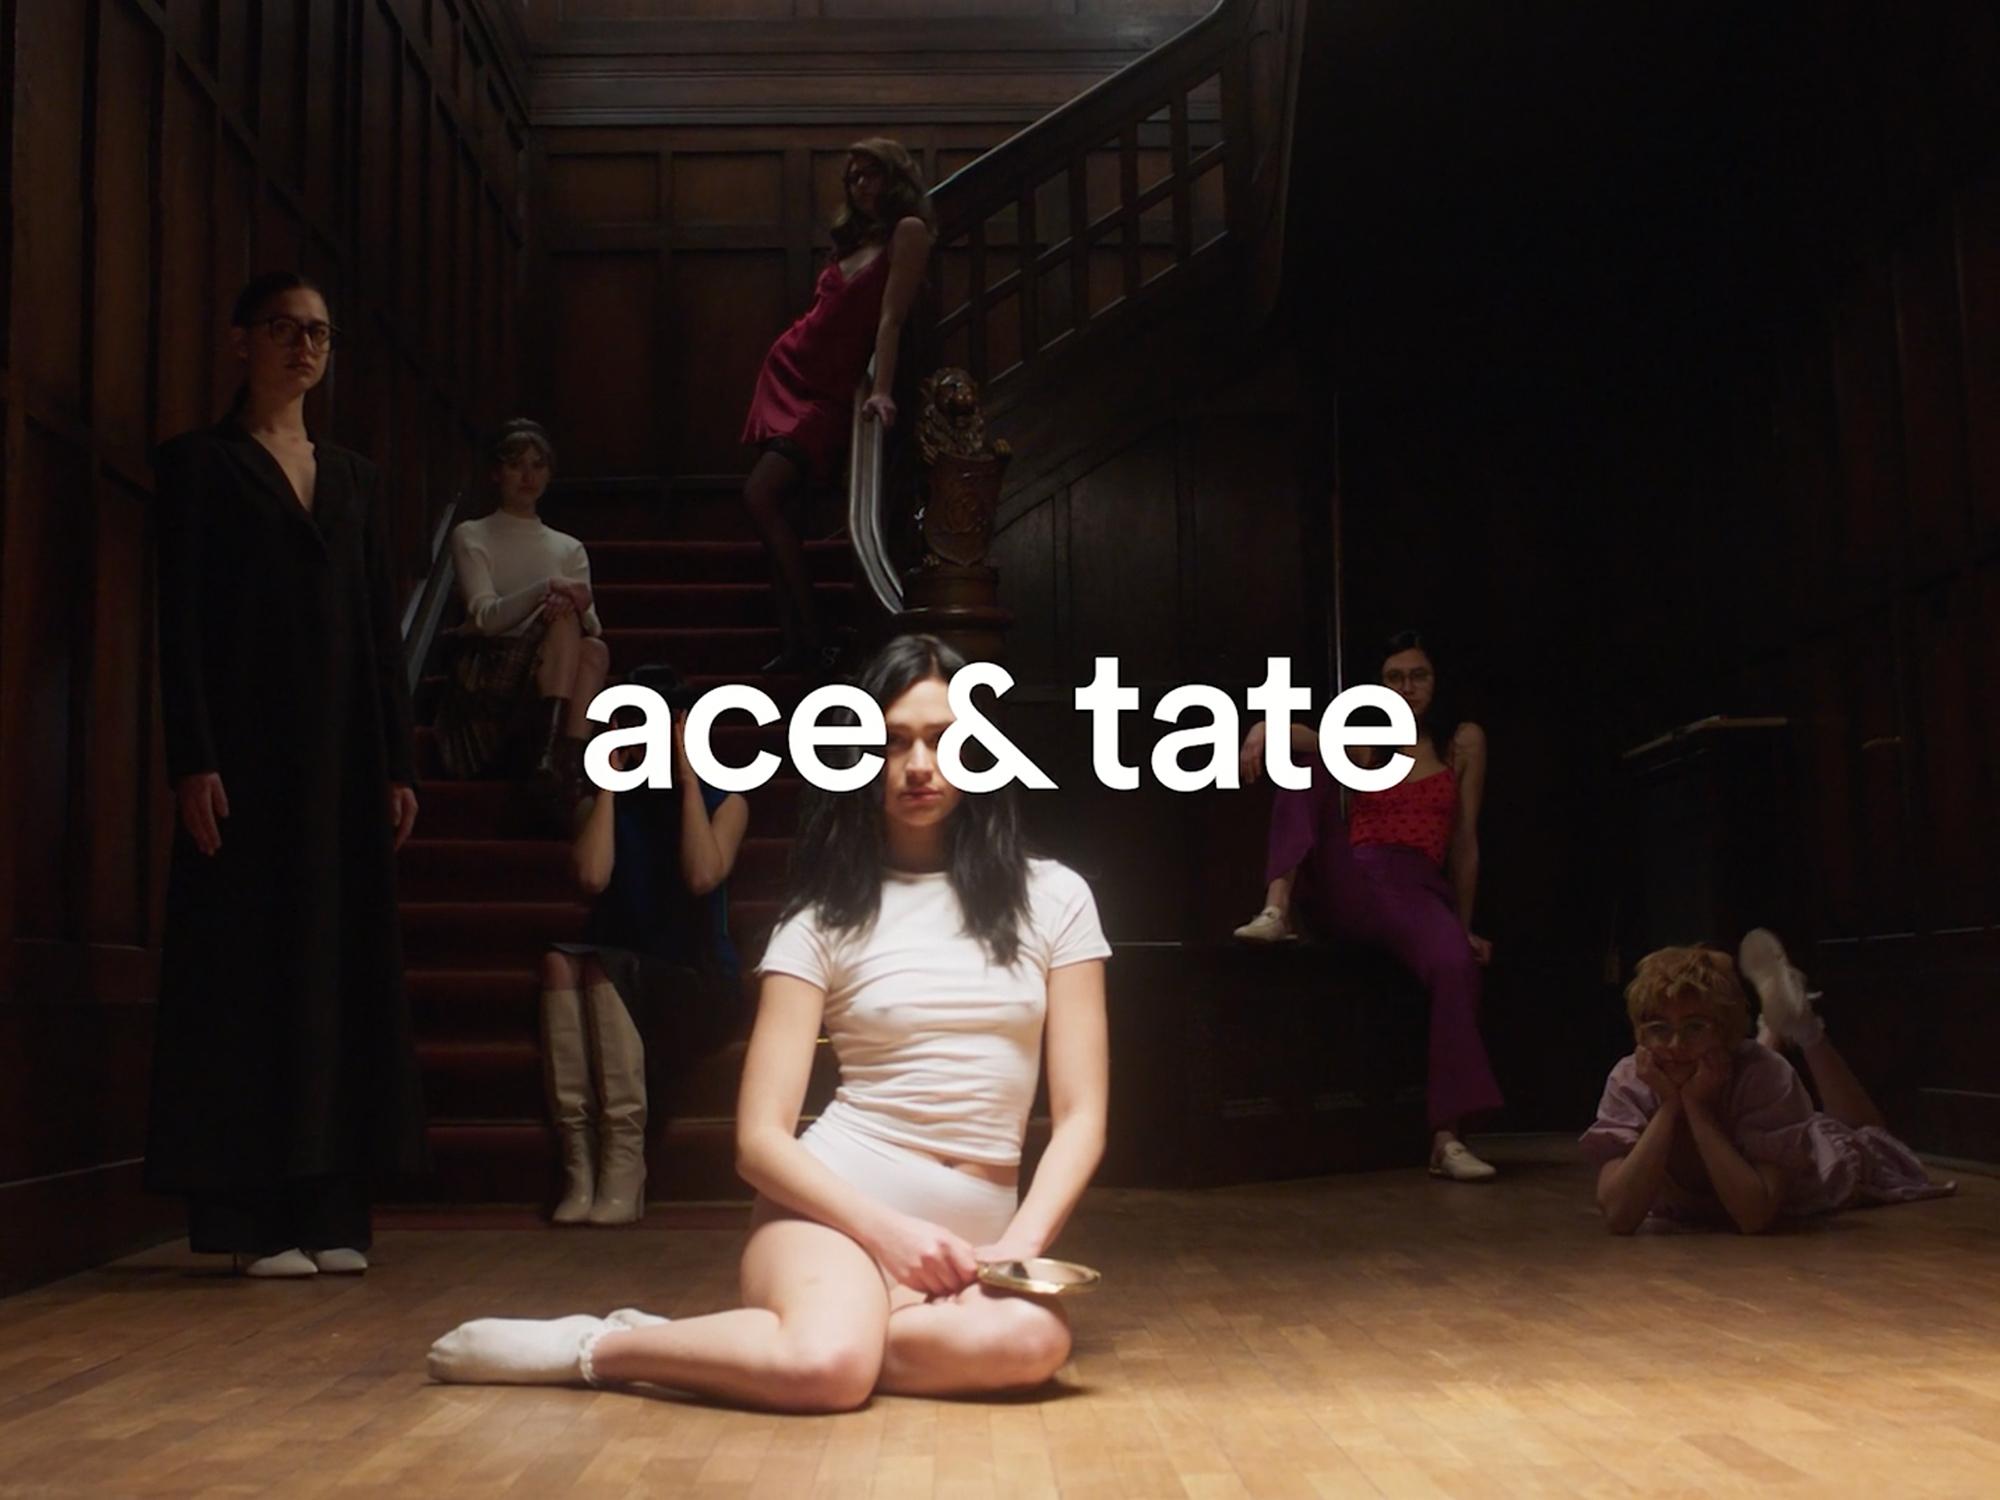 Ace&tate final shot mit Logo